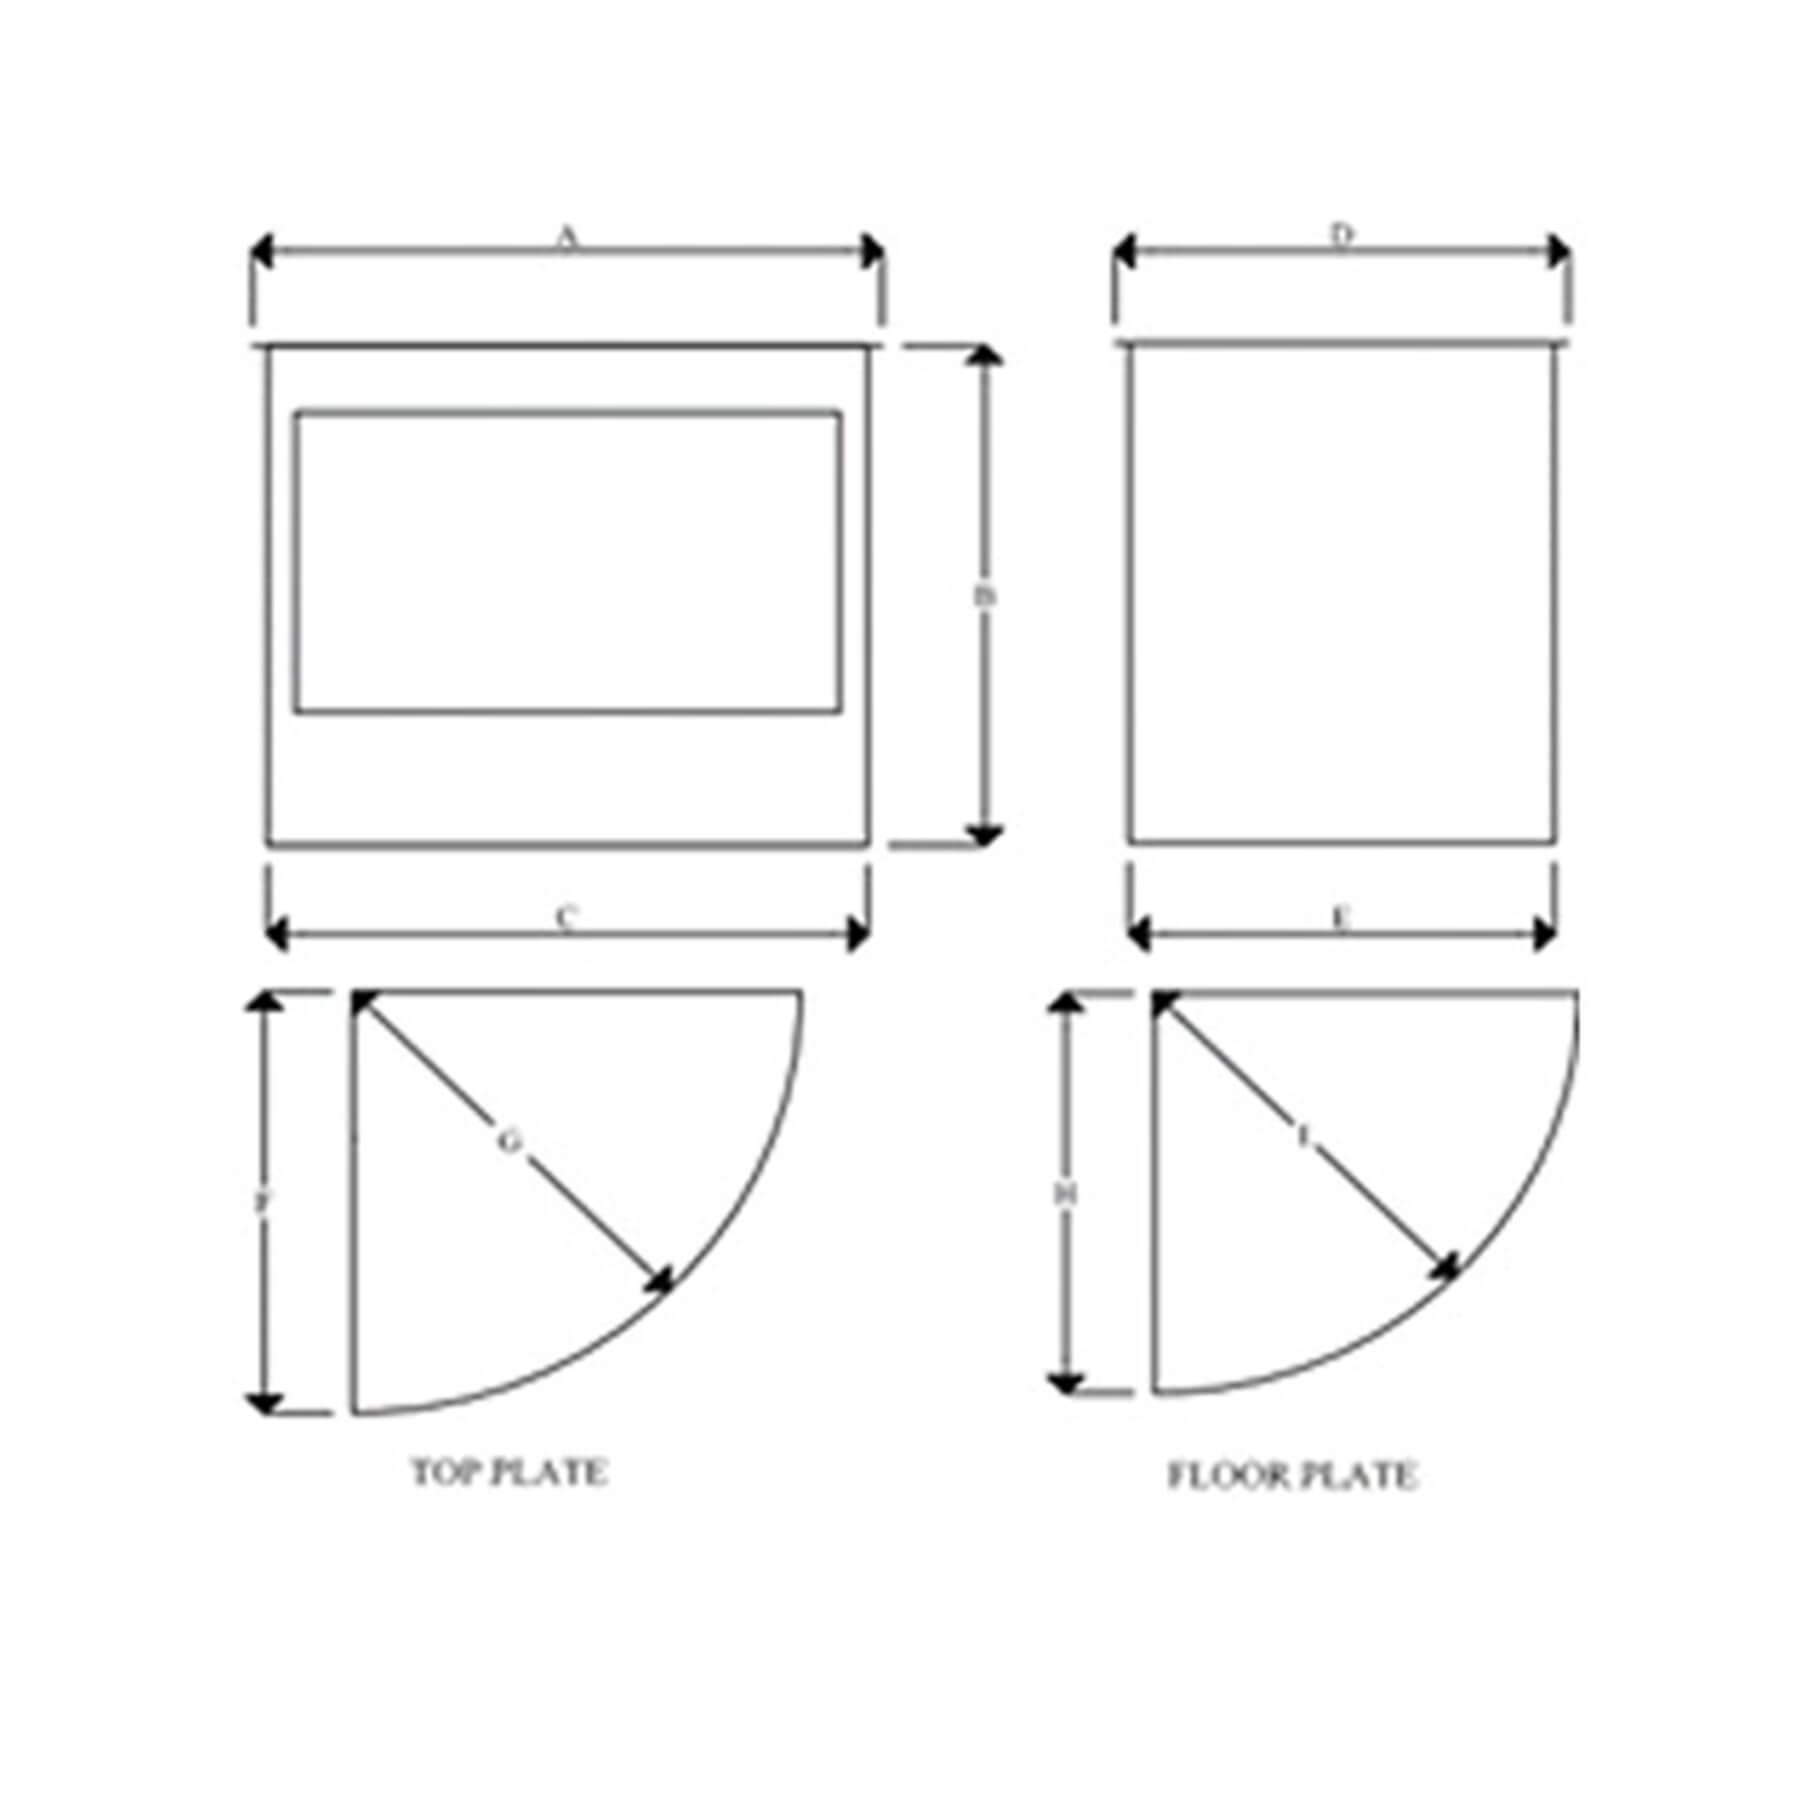 Panoramic-Gas-Firebox-Freestanding-Model-600-Dimensions